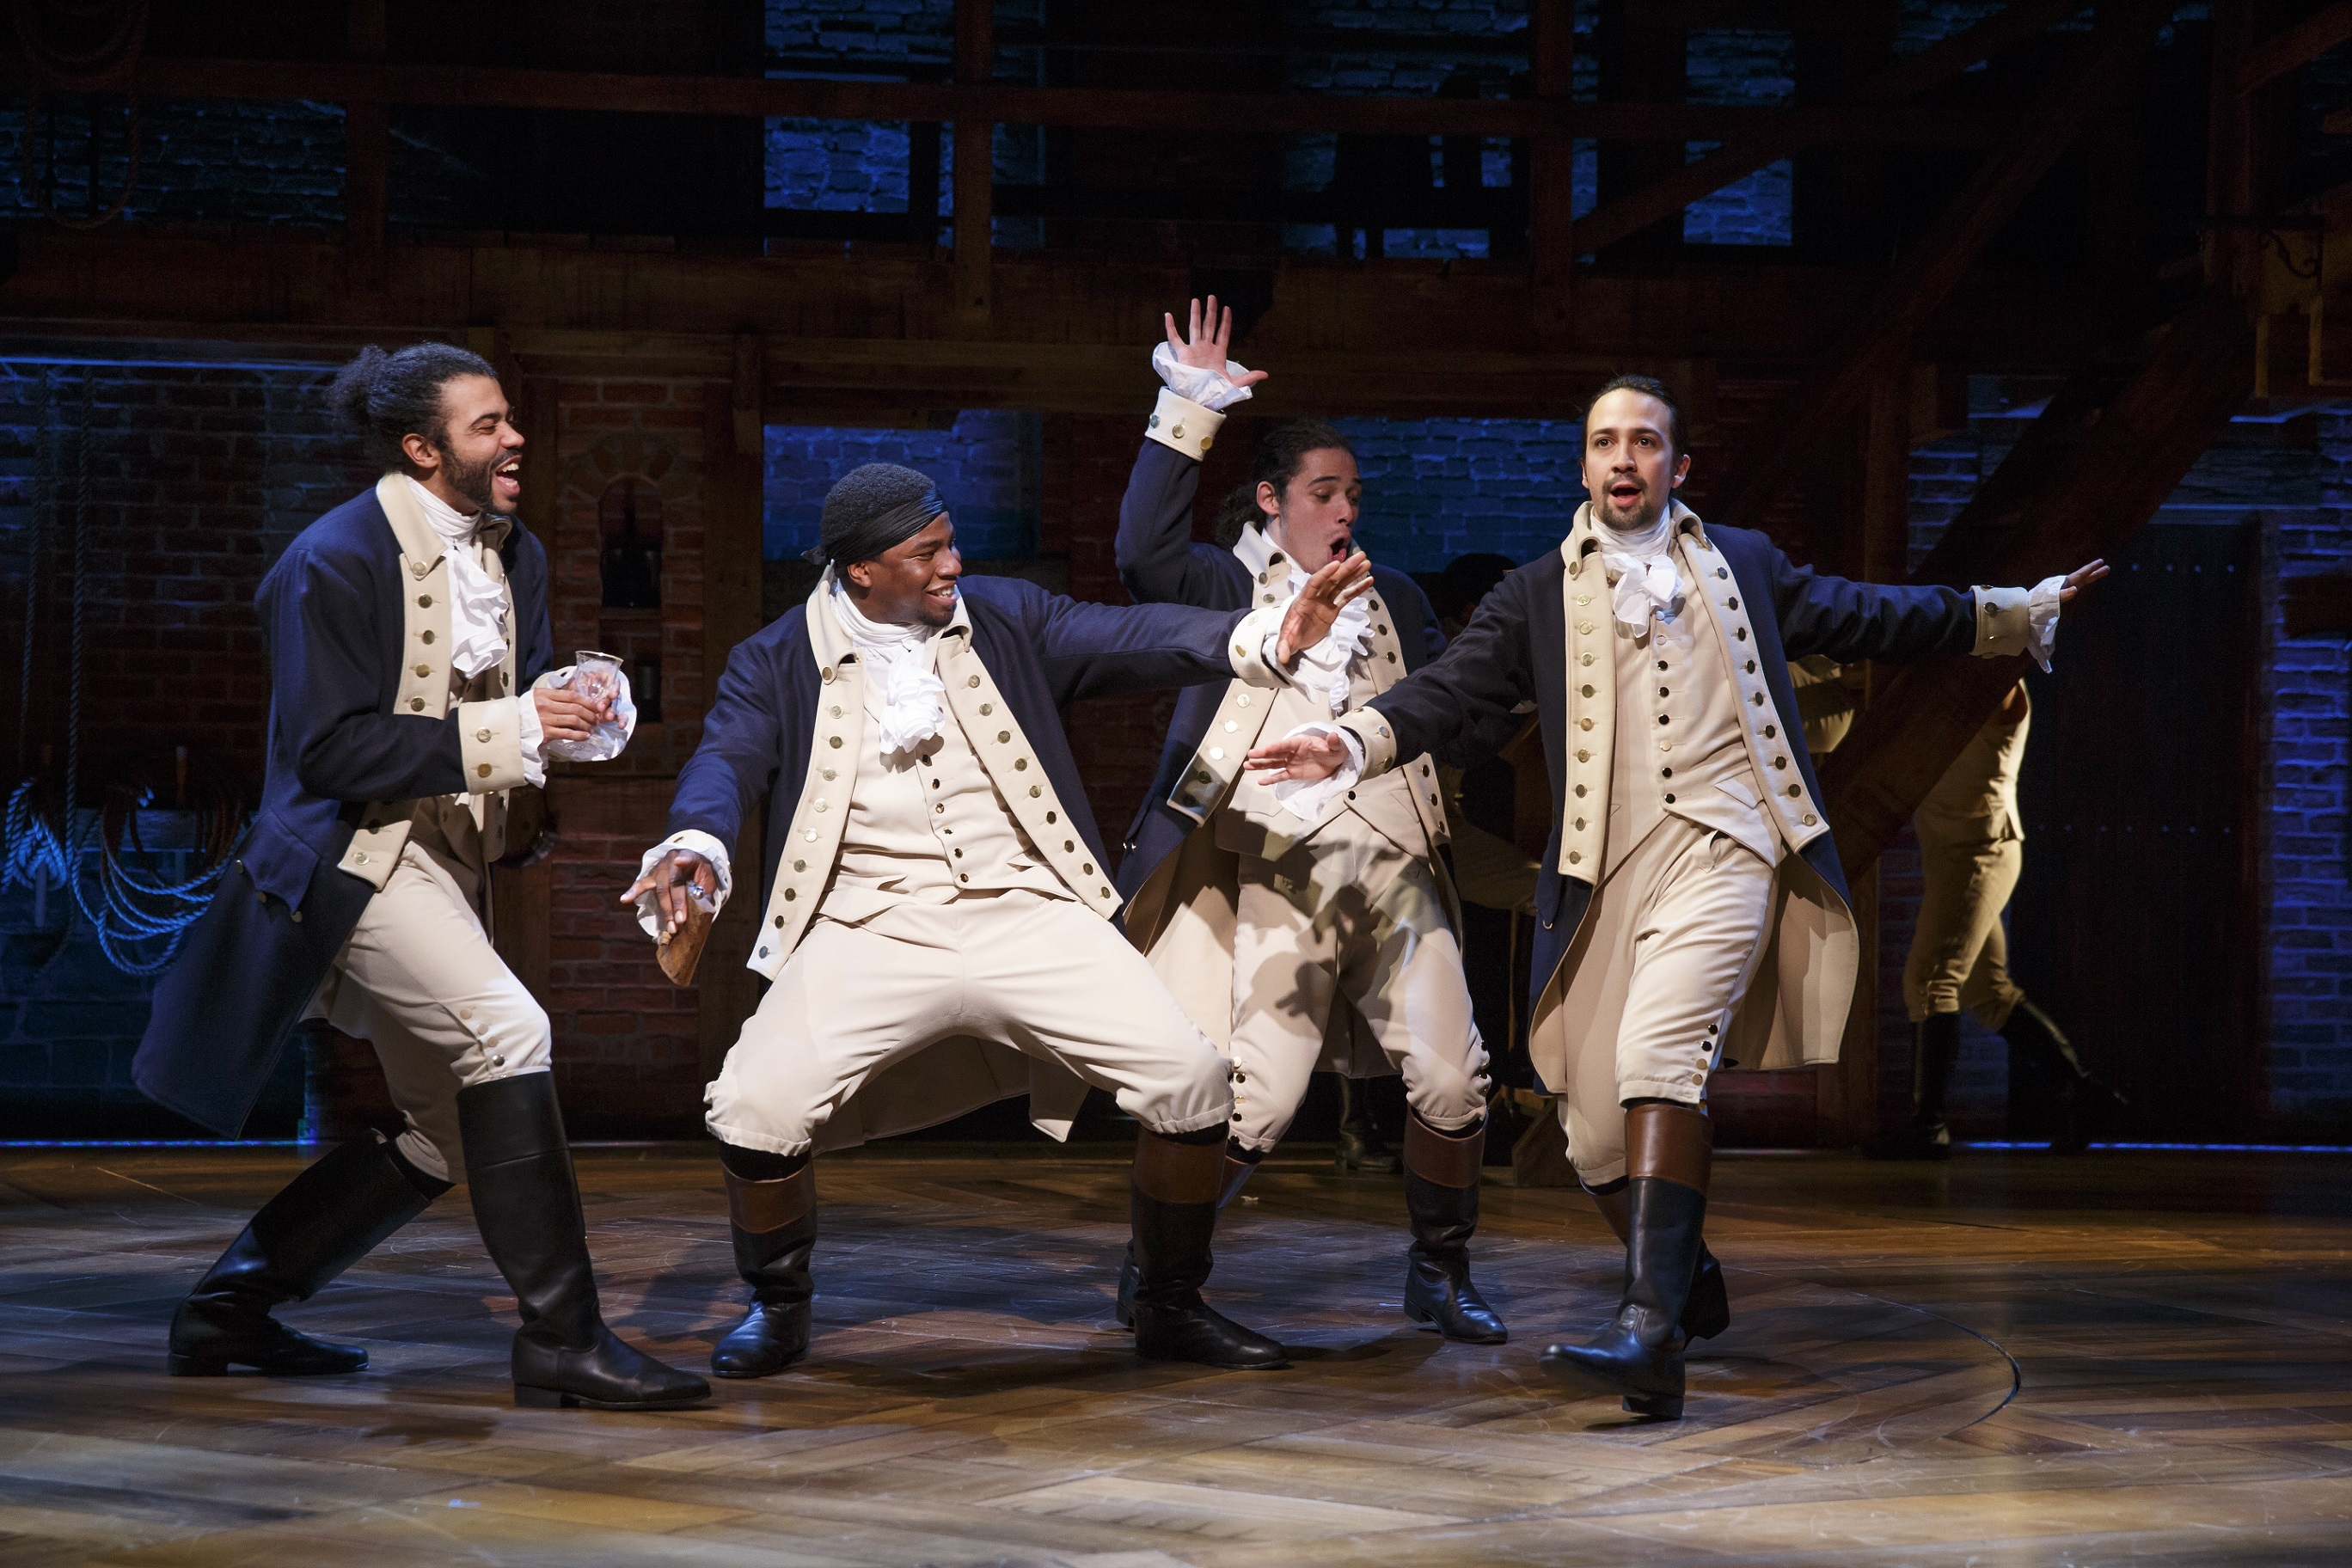 Daveed Diggs, Okieriete Onaodowan, Anthony Ramos, and Lin-Manuel Miranda in the original Broadway Cast of Hamilton.